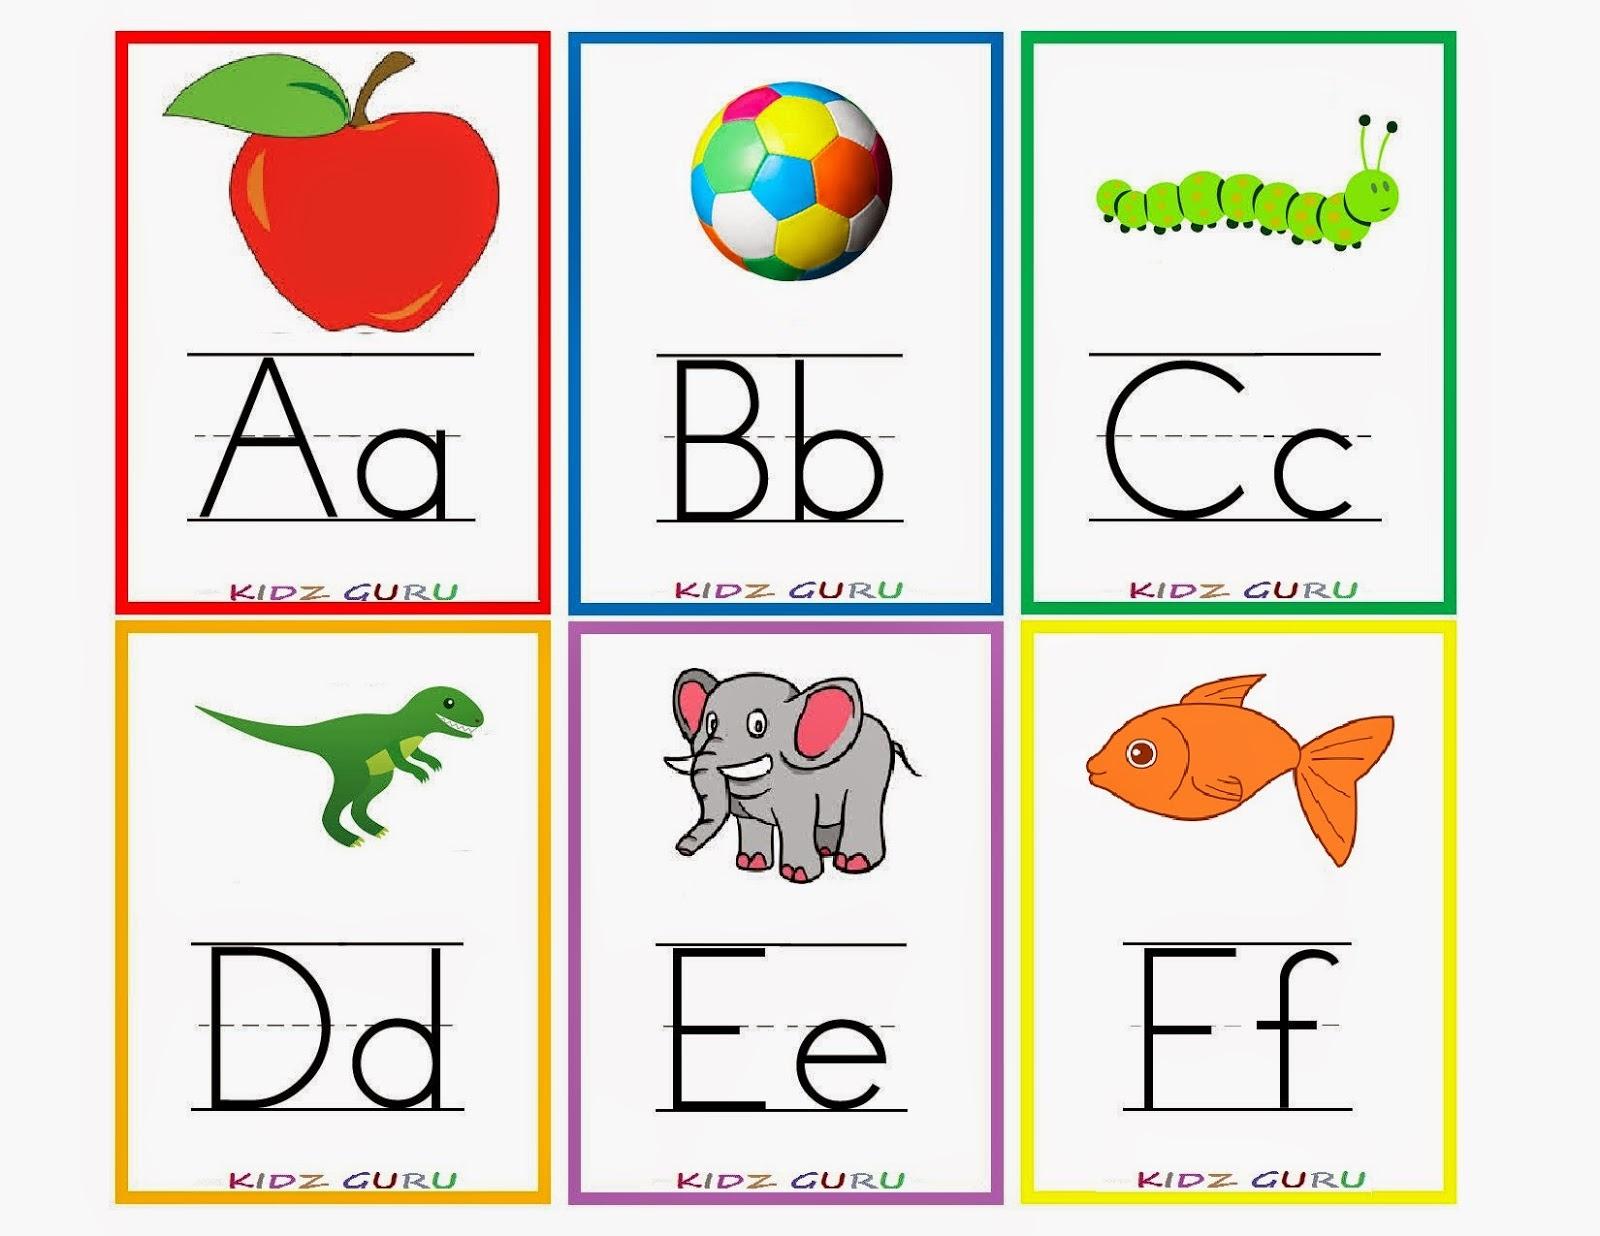 Kindergarten Worksheets: Printable Worksheets - Alphabet Flash Cards 1 - Abc Flash Cards Free Printable